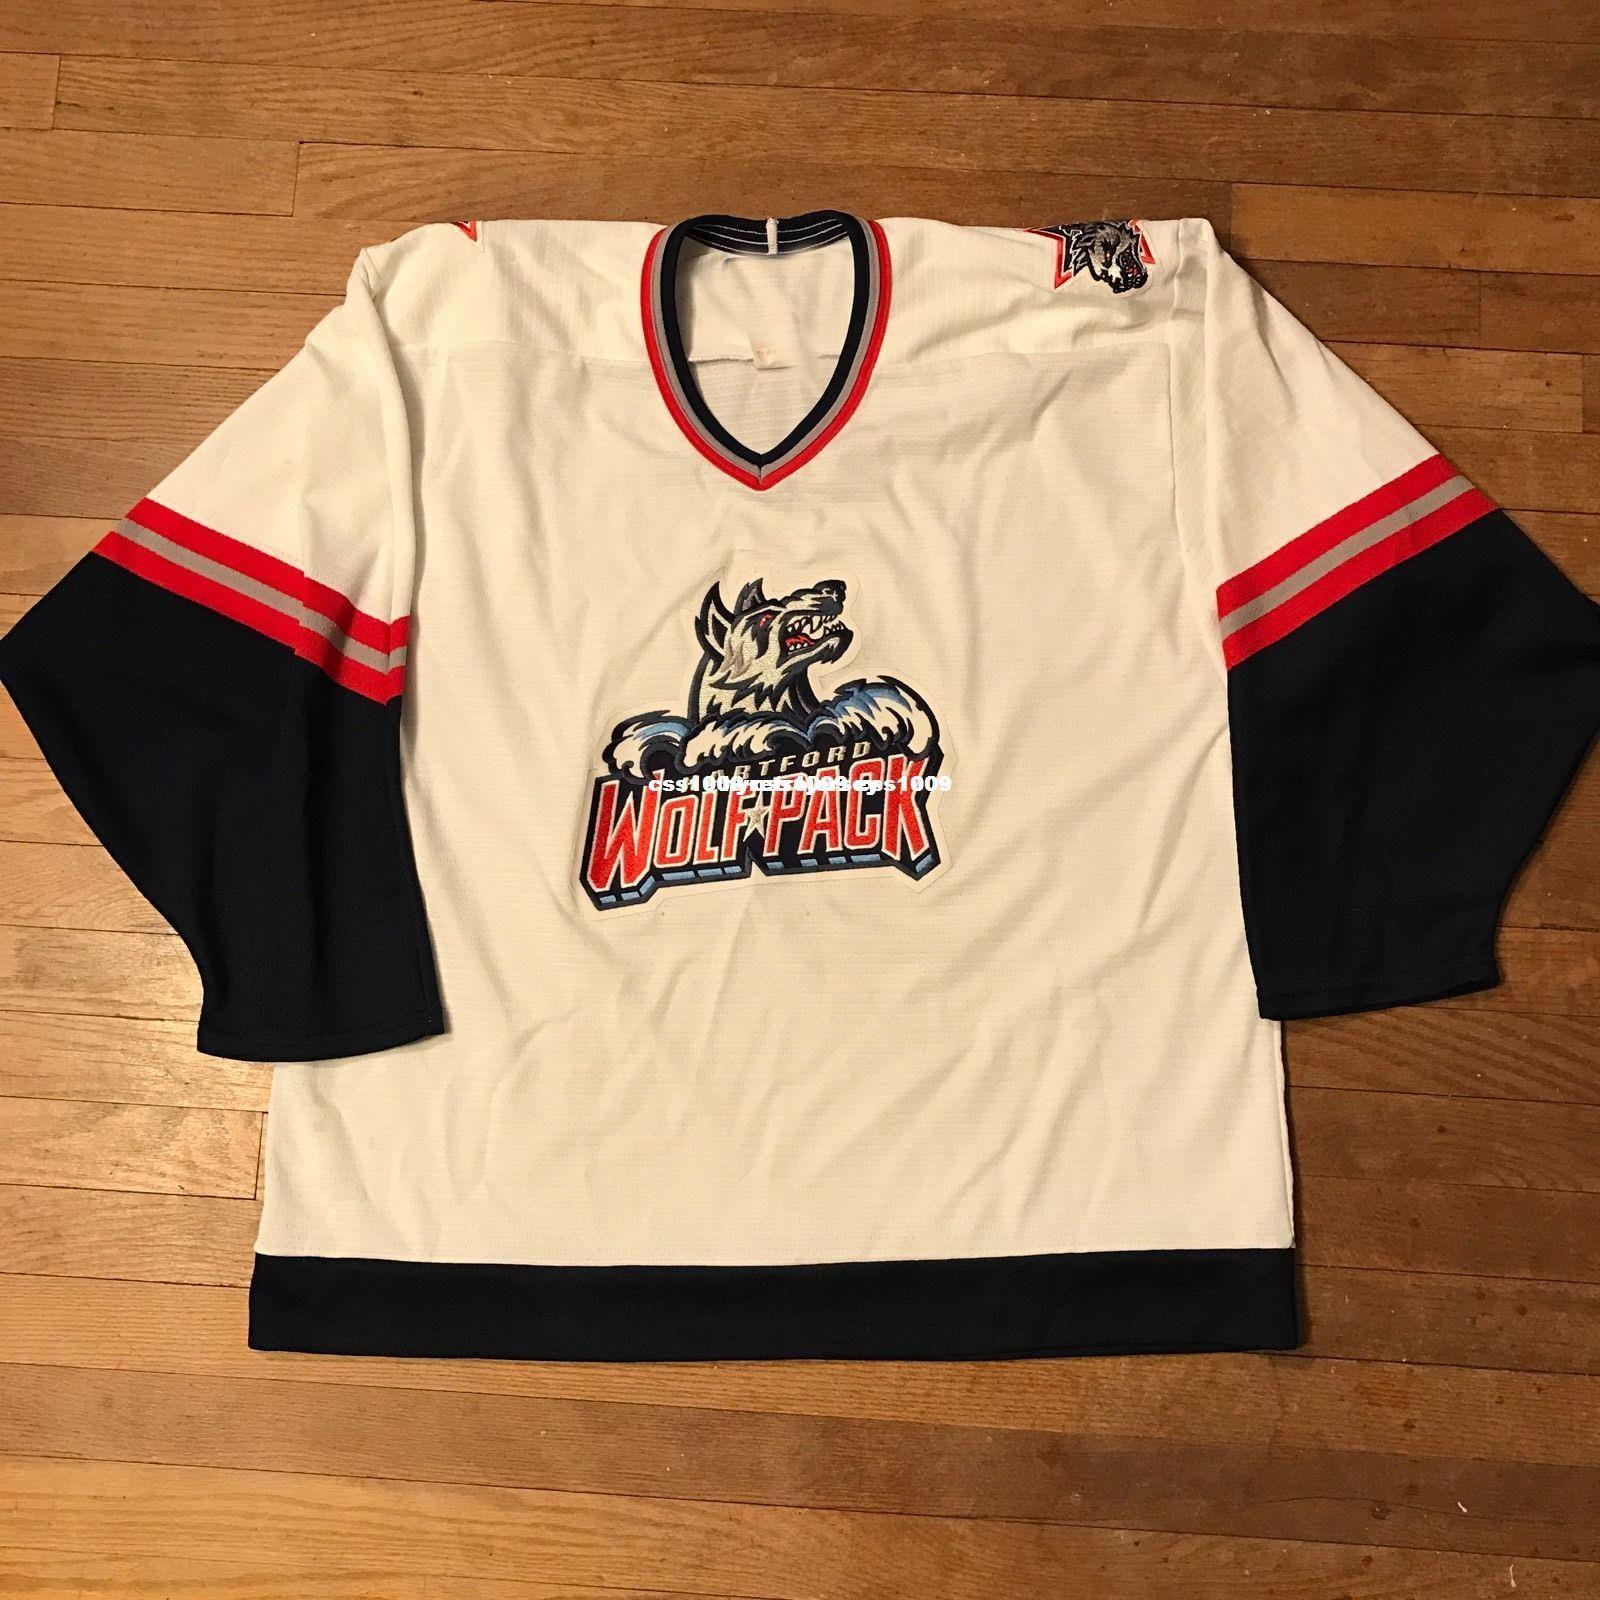 Cheap Custom Vintage Hartford Wolfpack Hockey Jersey AHL Whalers ... b837fca1f2a